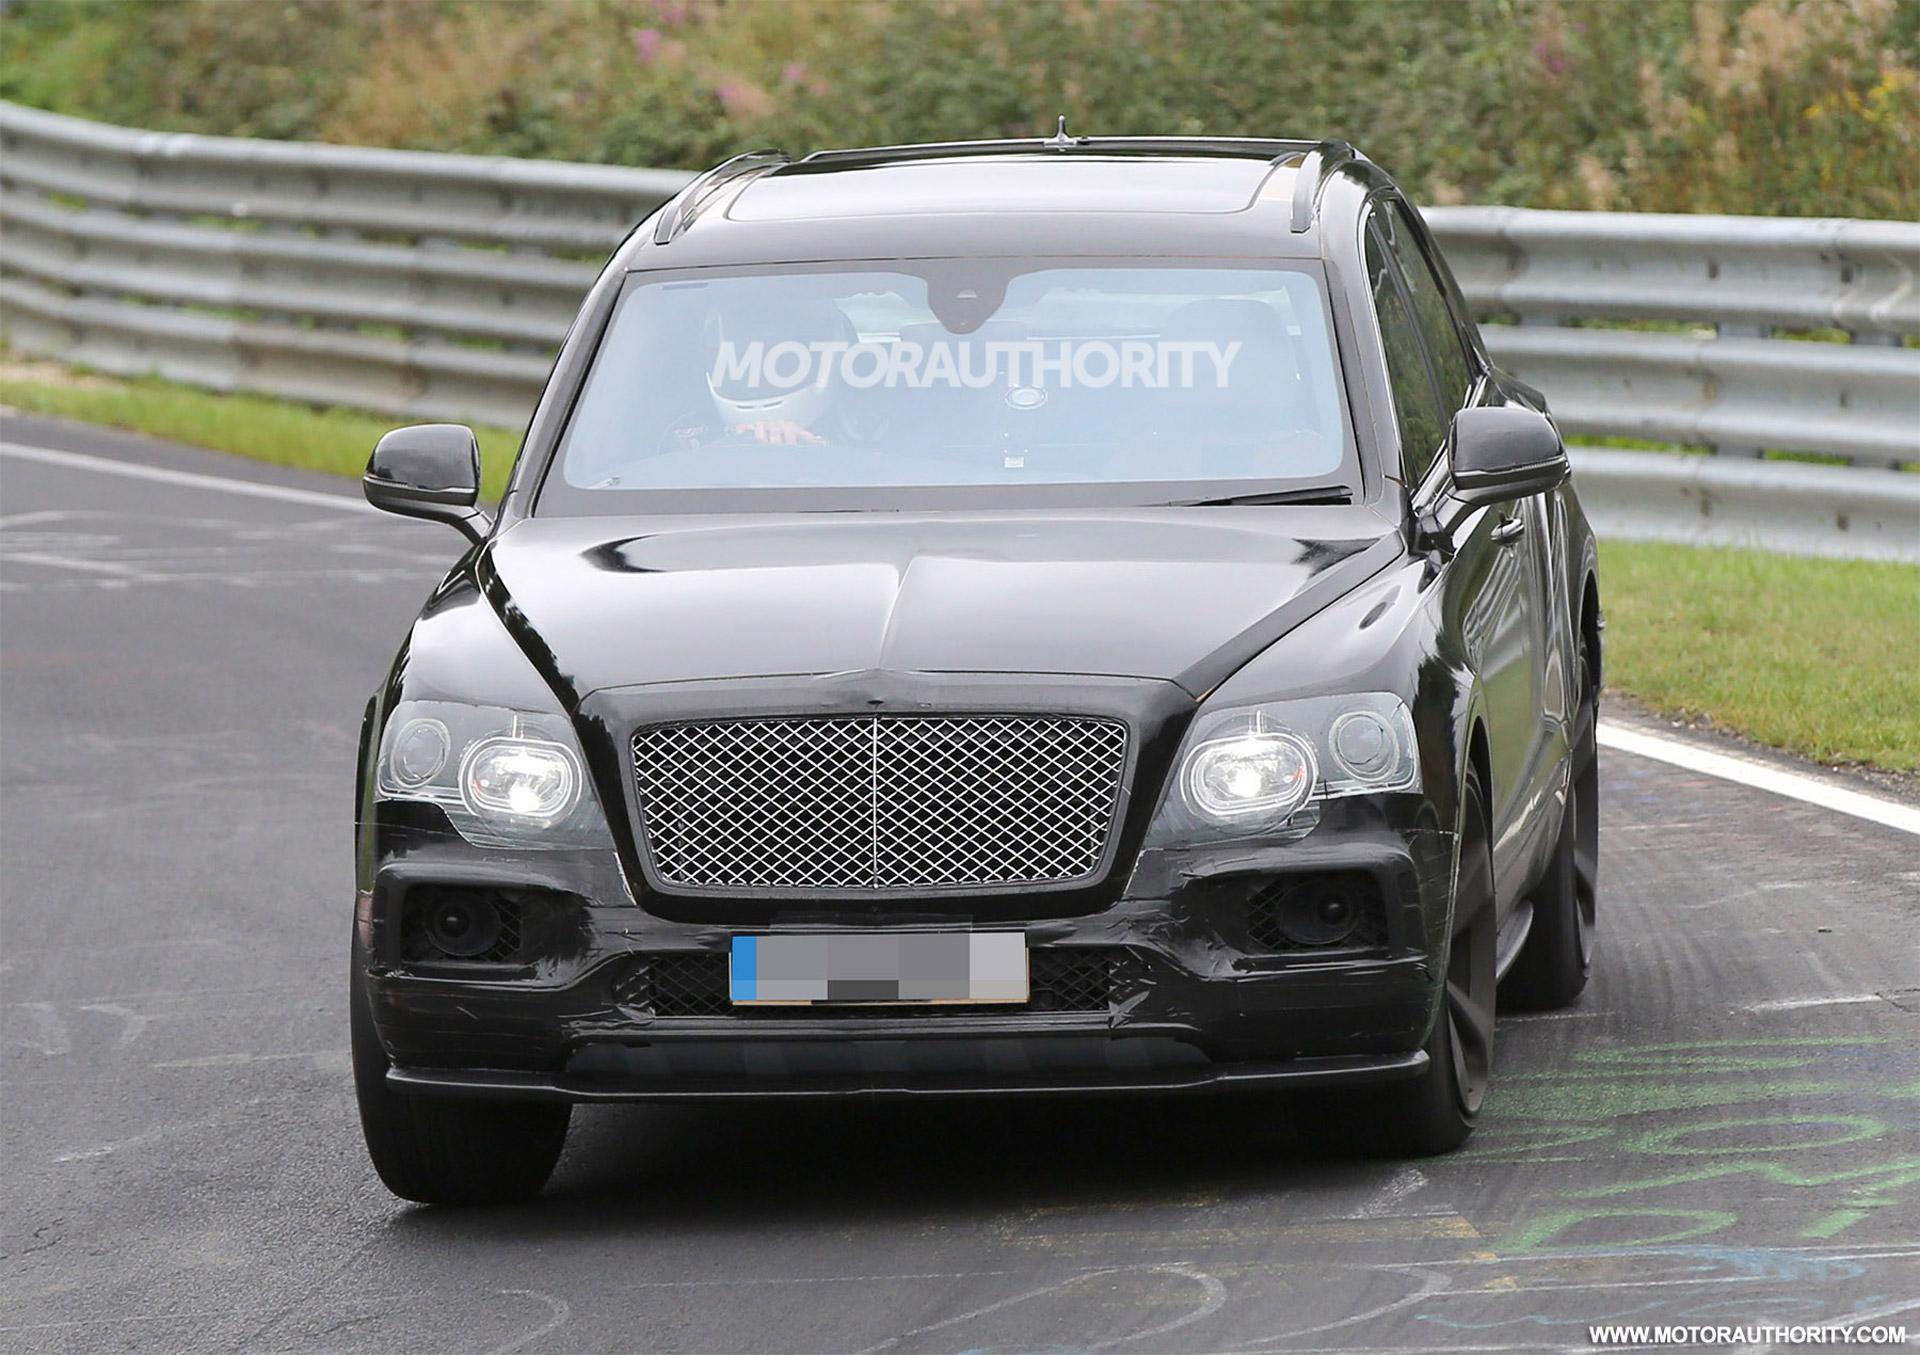 2020 Bentley Bentayga Speed Spy Shots